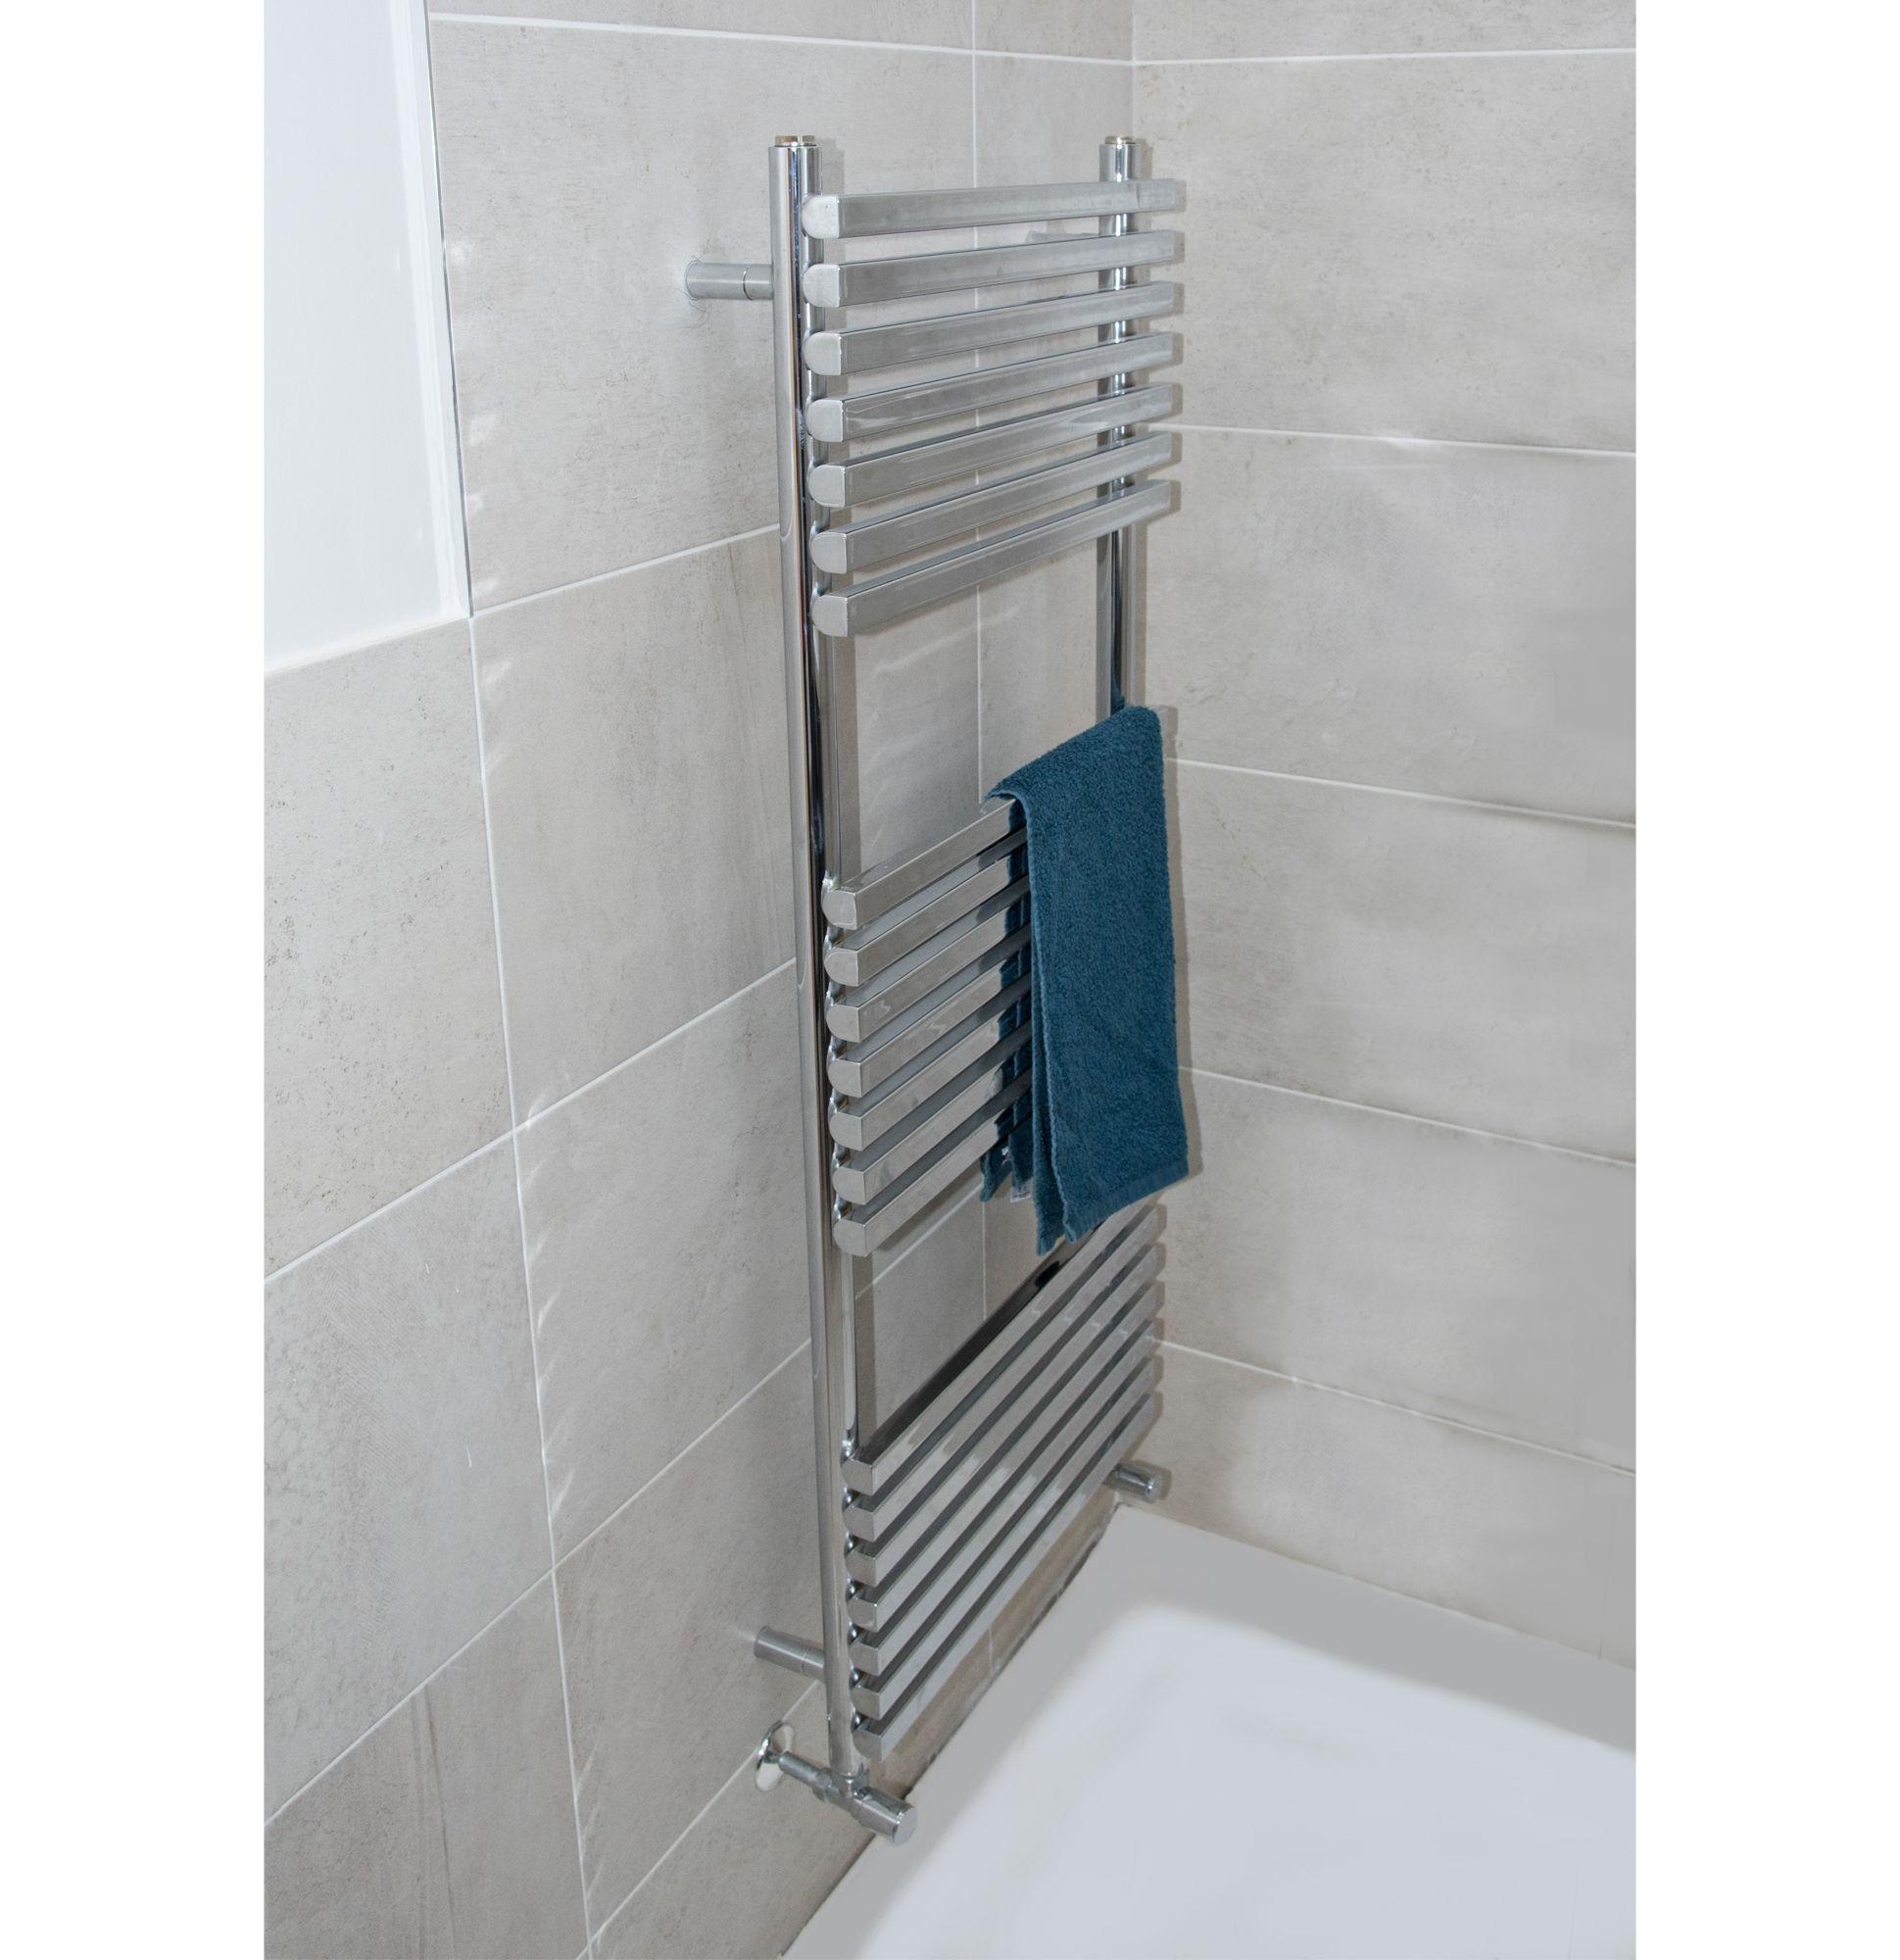 Chrome Horton Designer Bathroom Heated Towel Rail Radiator Rad 1200mm x 500mm